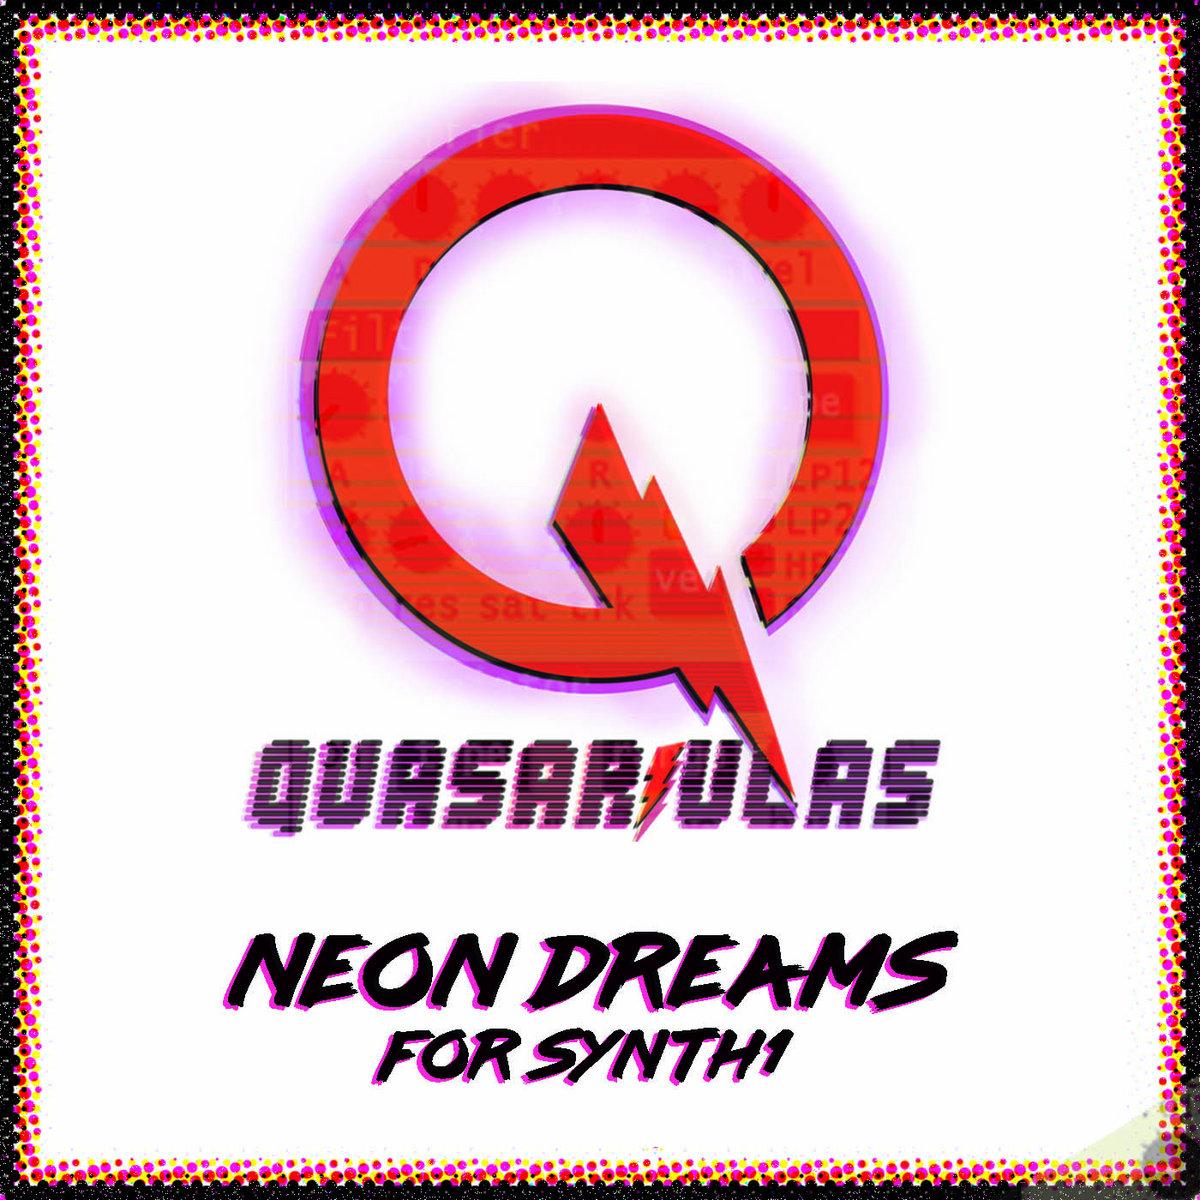 Neon Dreams Patch Bank (for synth1) | Quasar_Ulas